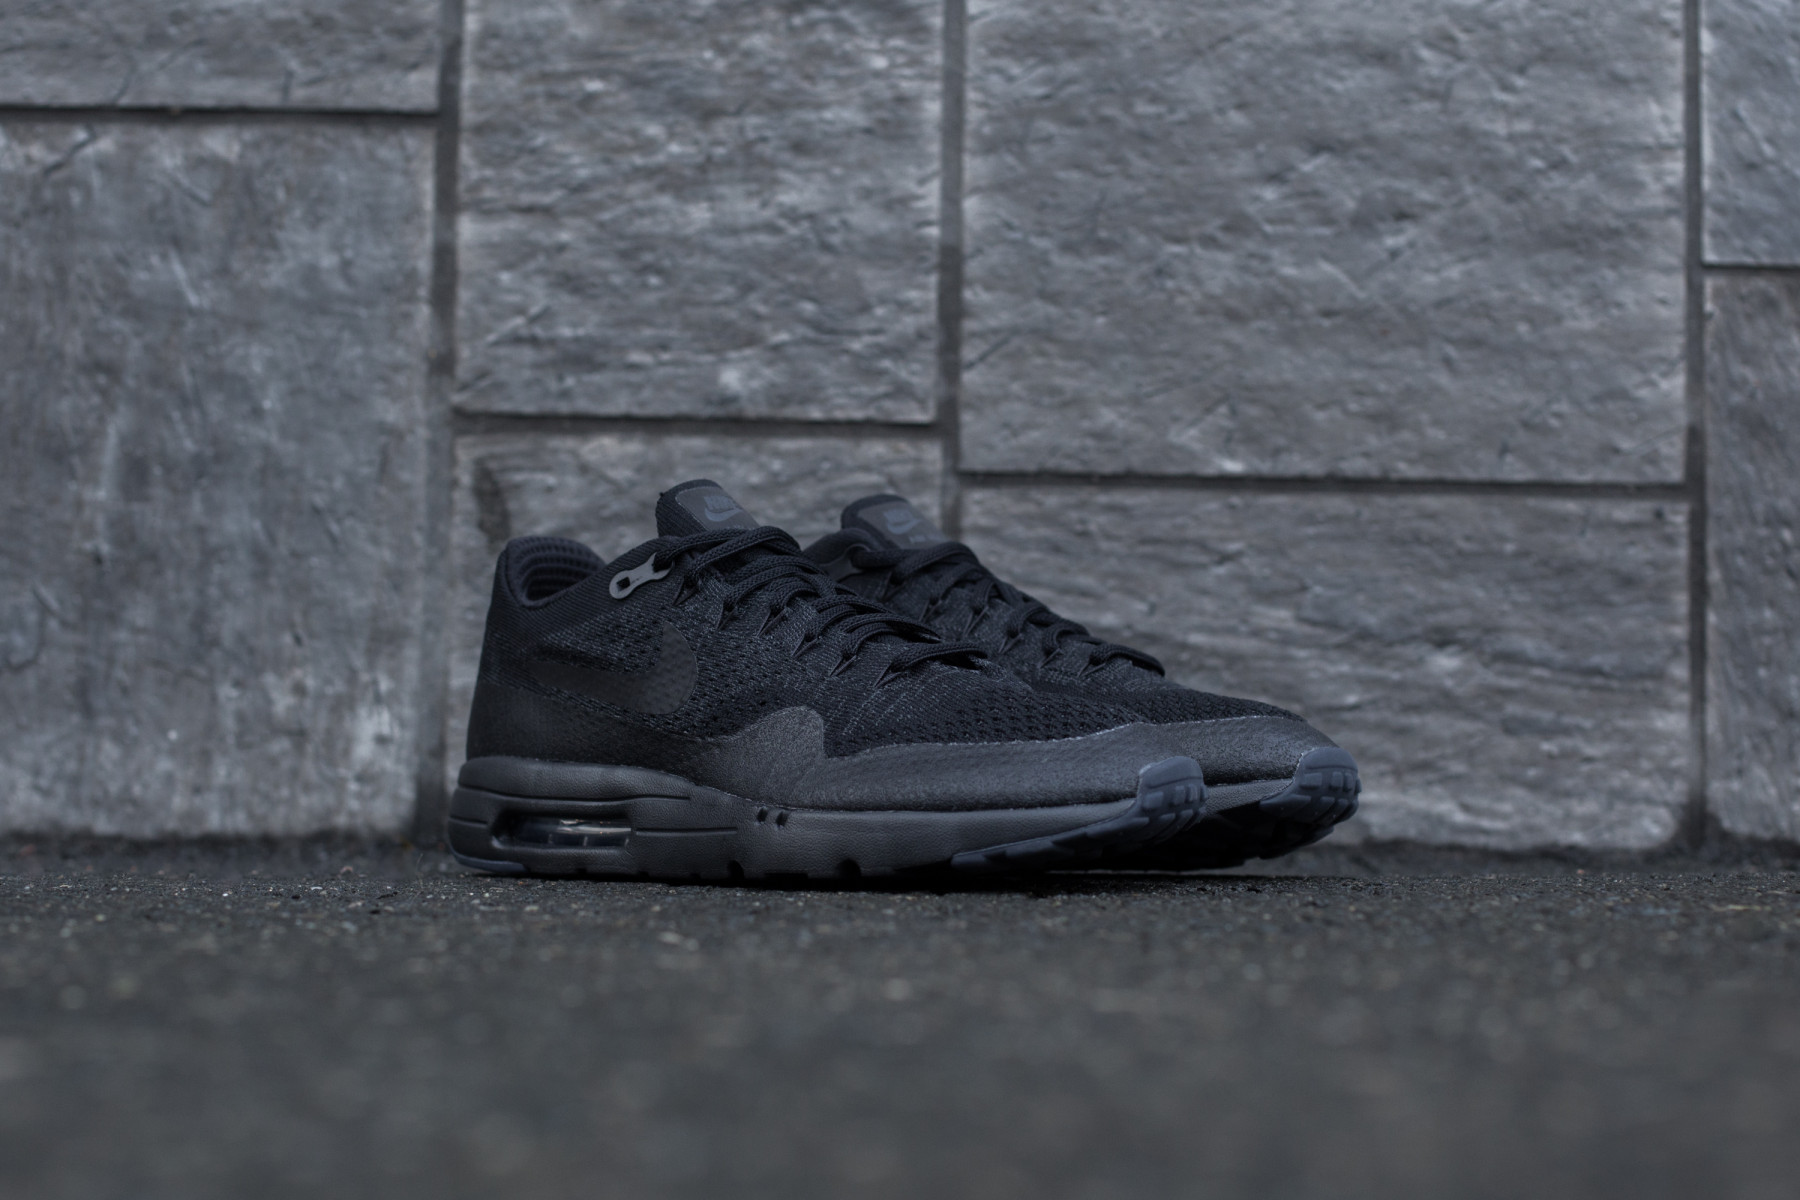 Nike Air Max 1 Ultra Flyknit Herre Sneakers Sneaker.no